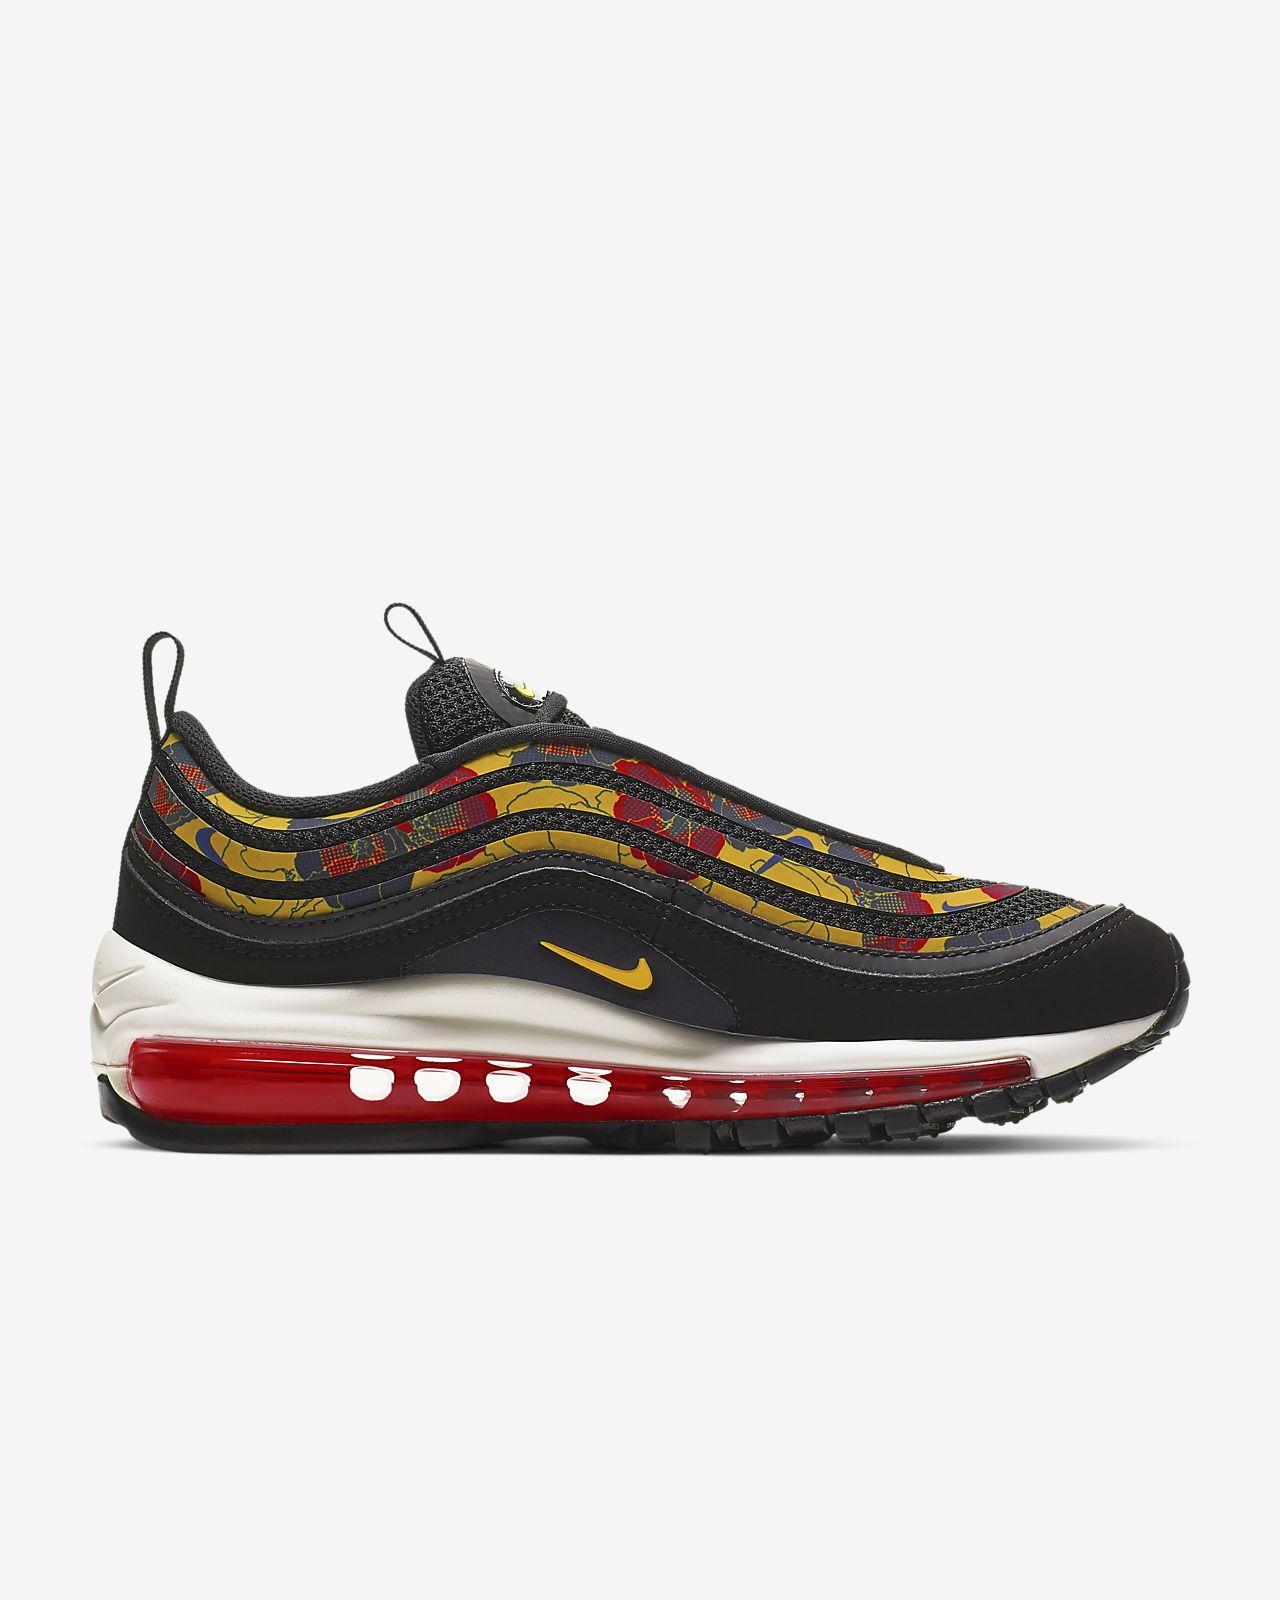 Nike Air Max 97 Men's & Women's Shoes | Flight Club